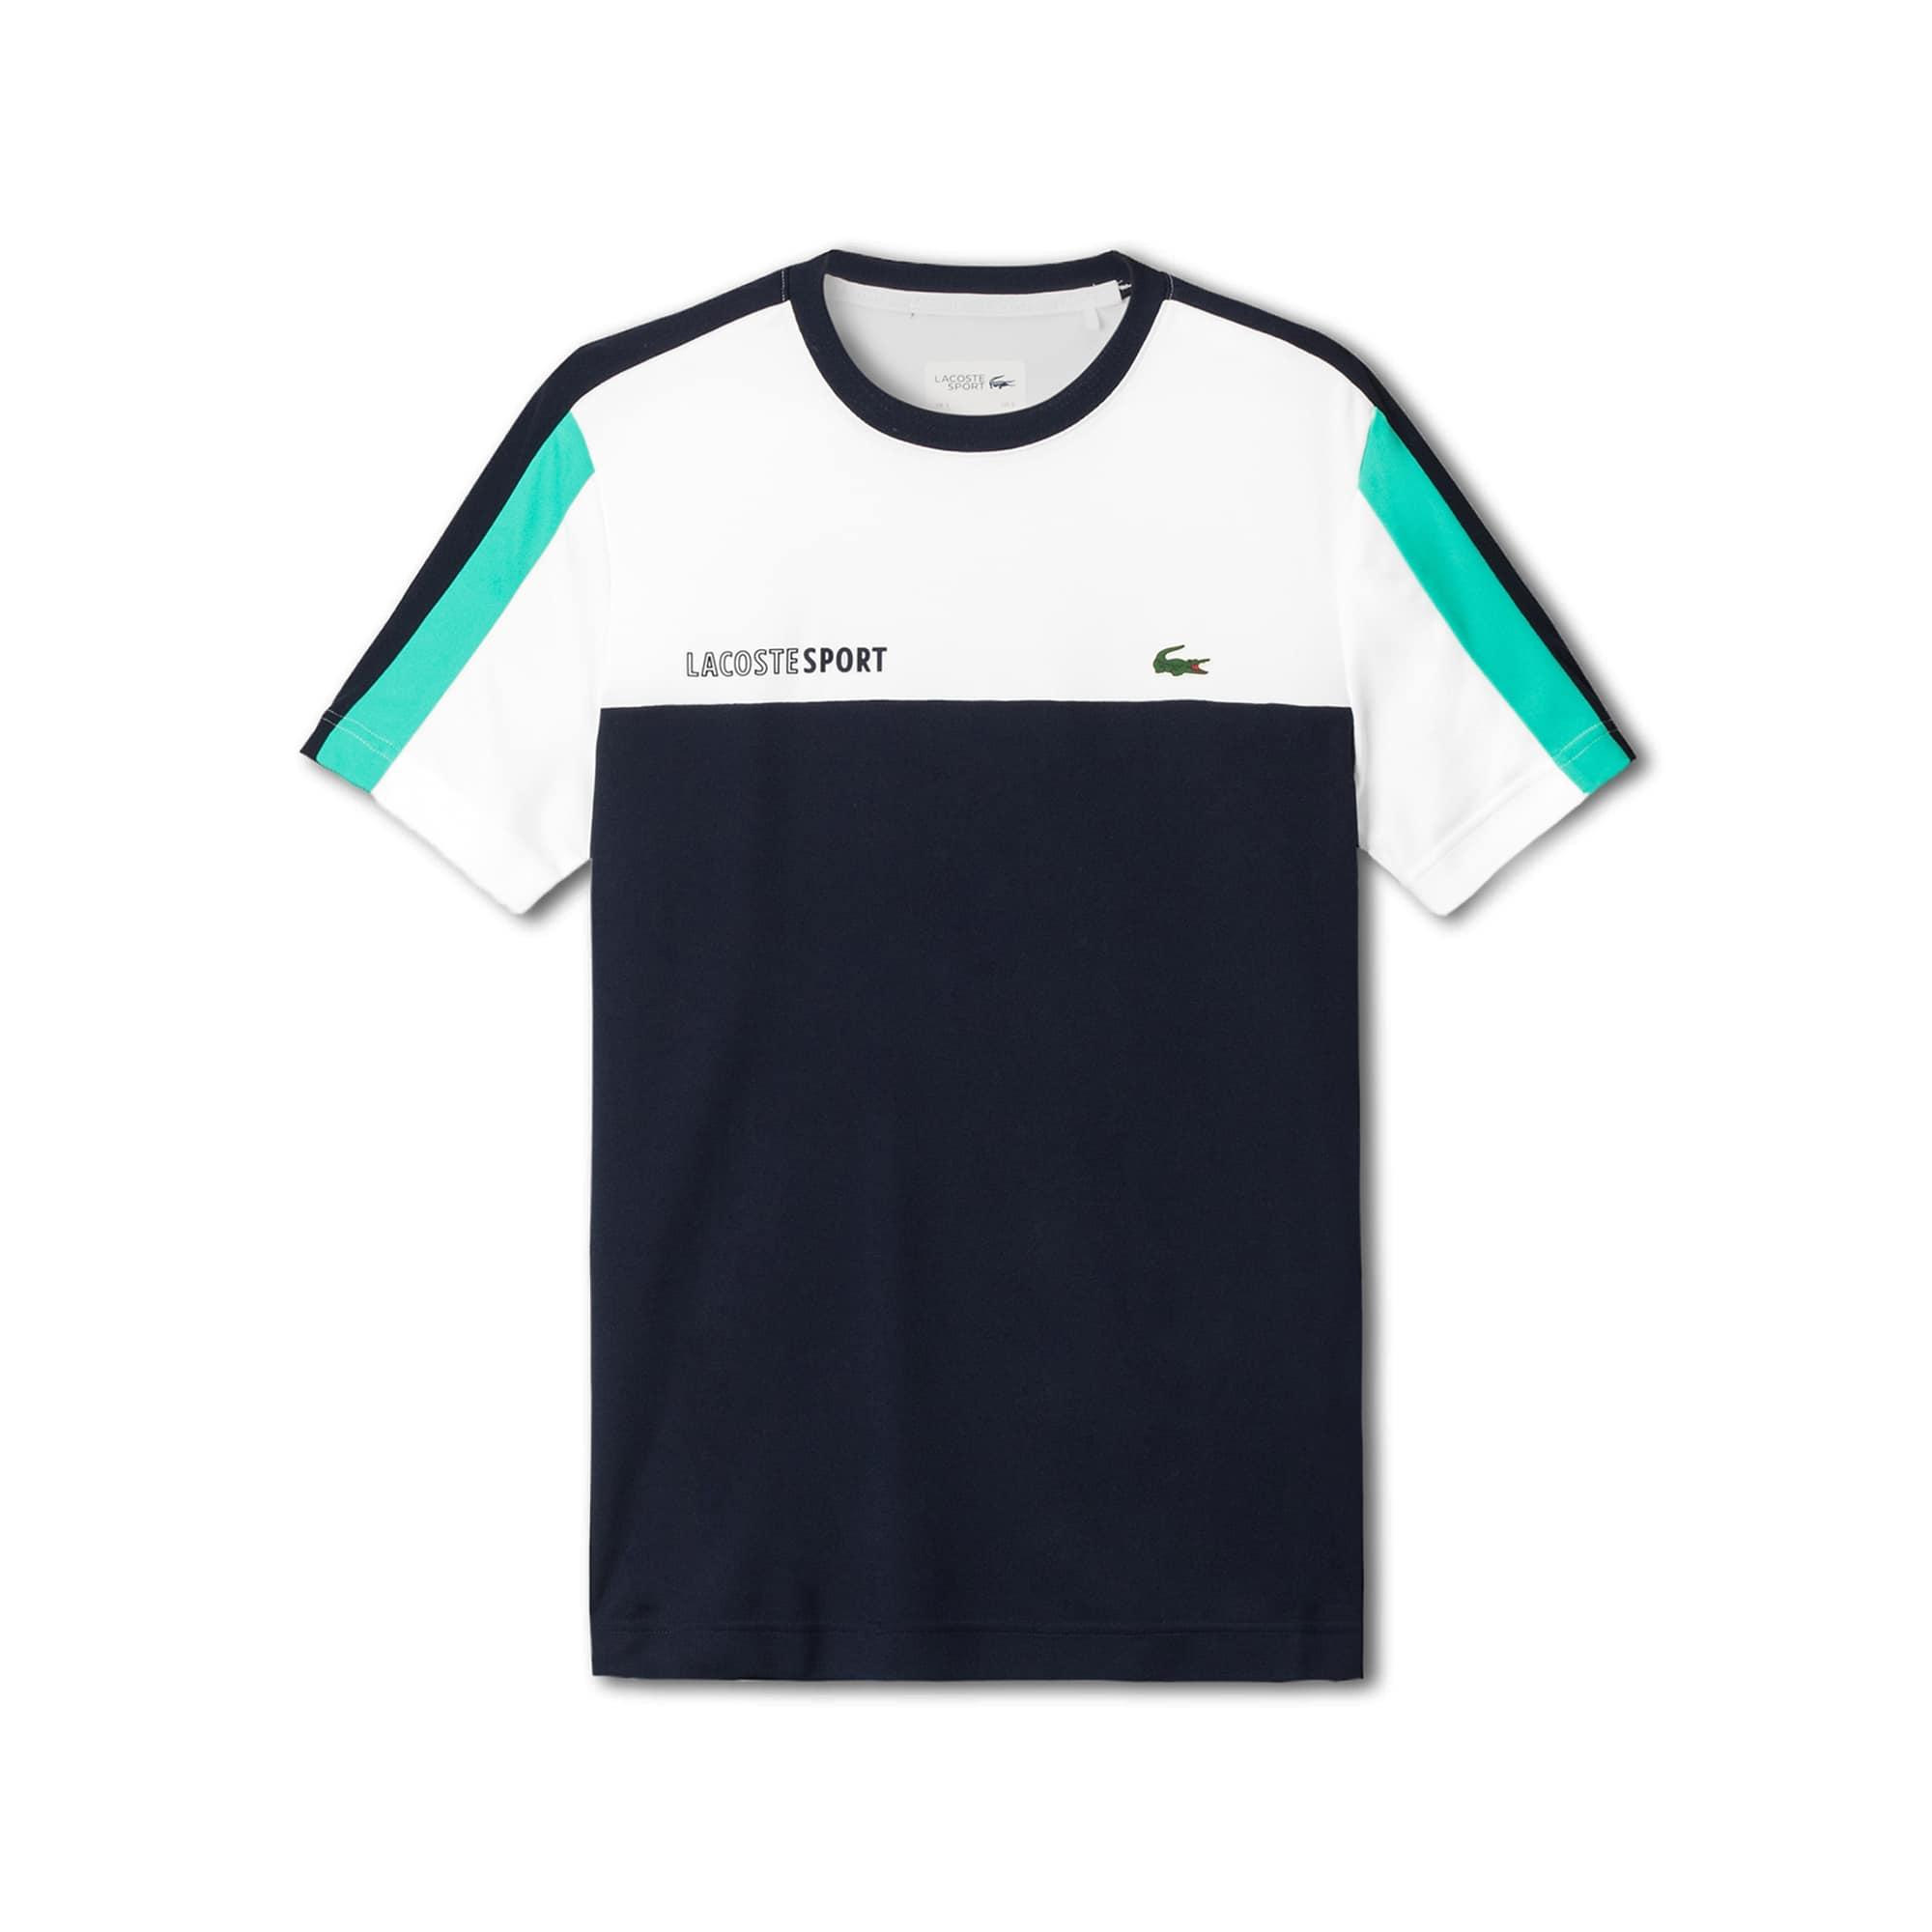 Lacoste SPORT男士圆领拼色凸纹网眼面料网球T恤